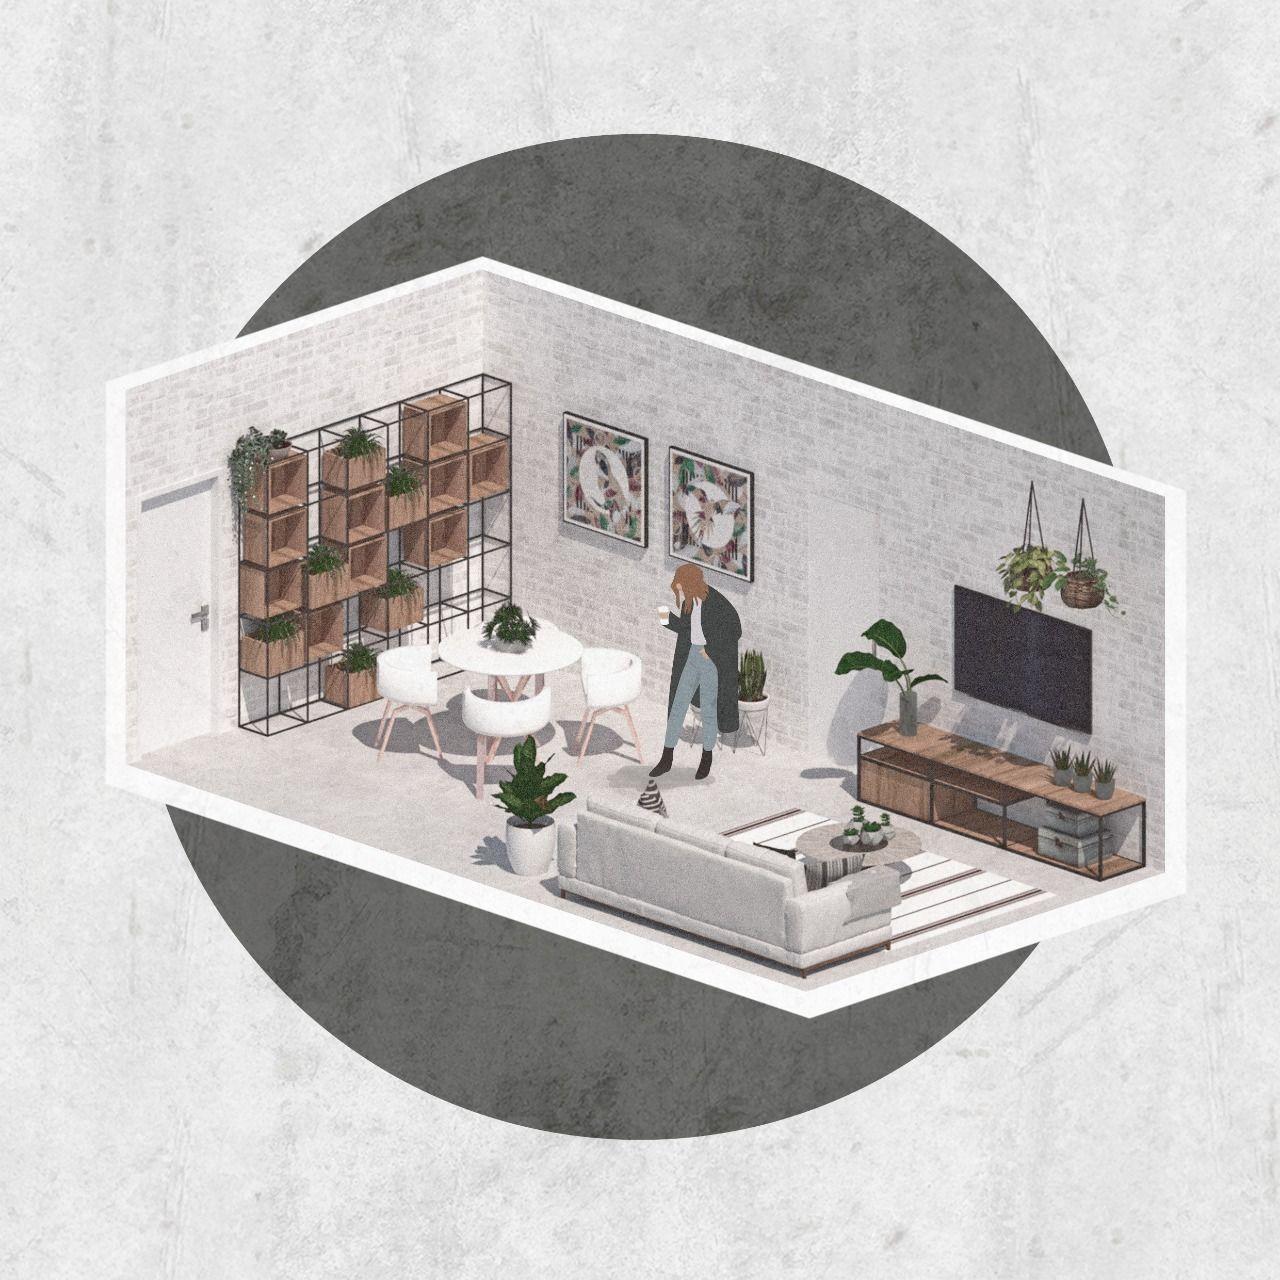 Apartamento Isométrica - Lauralee